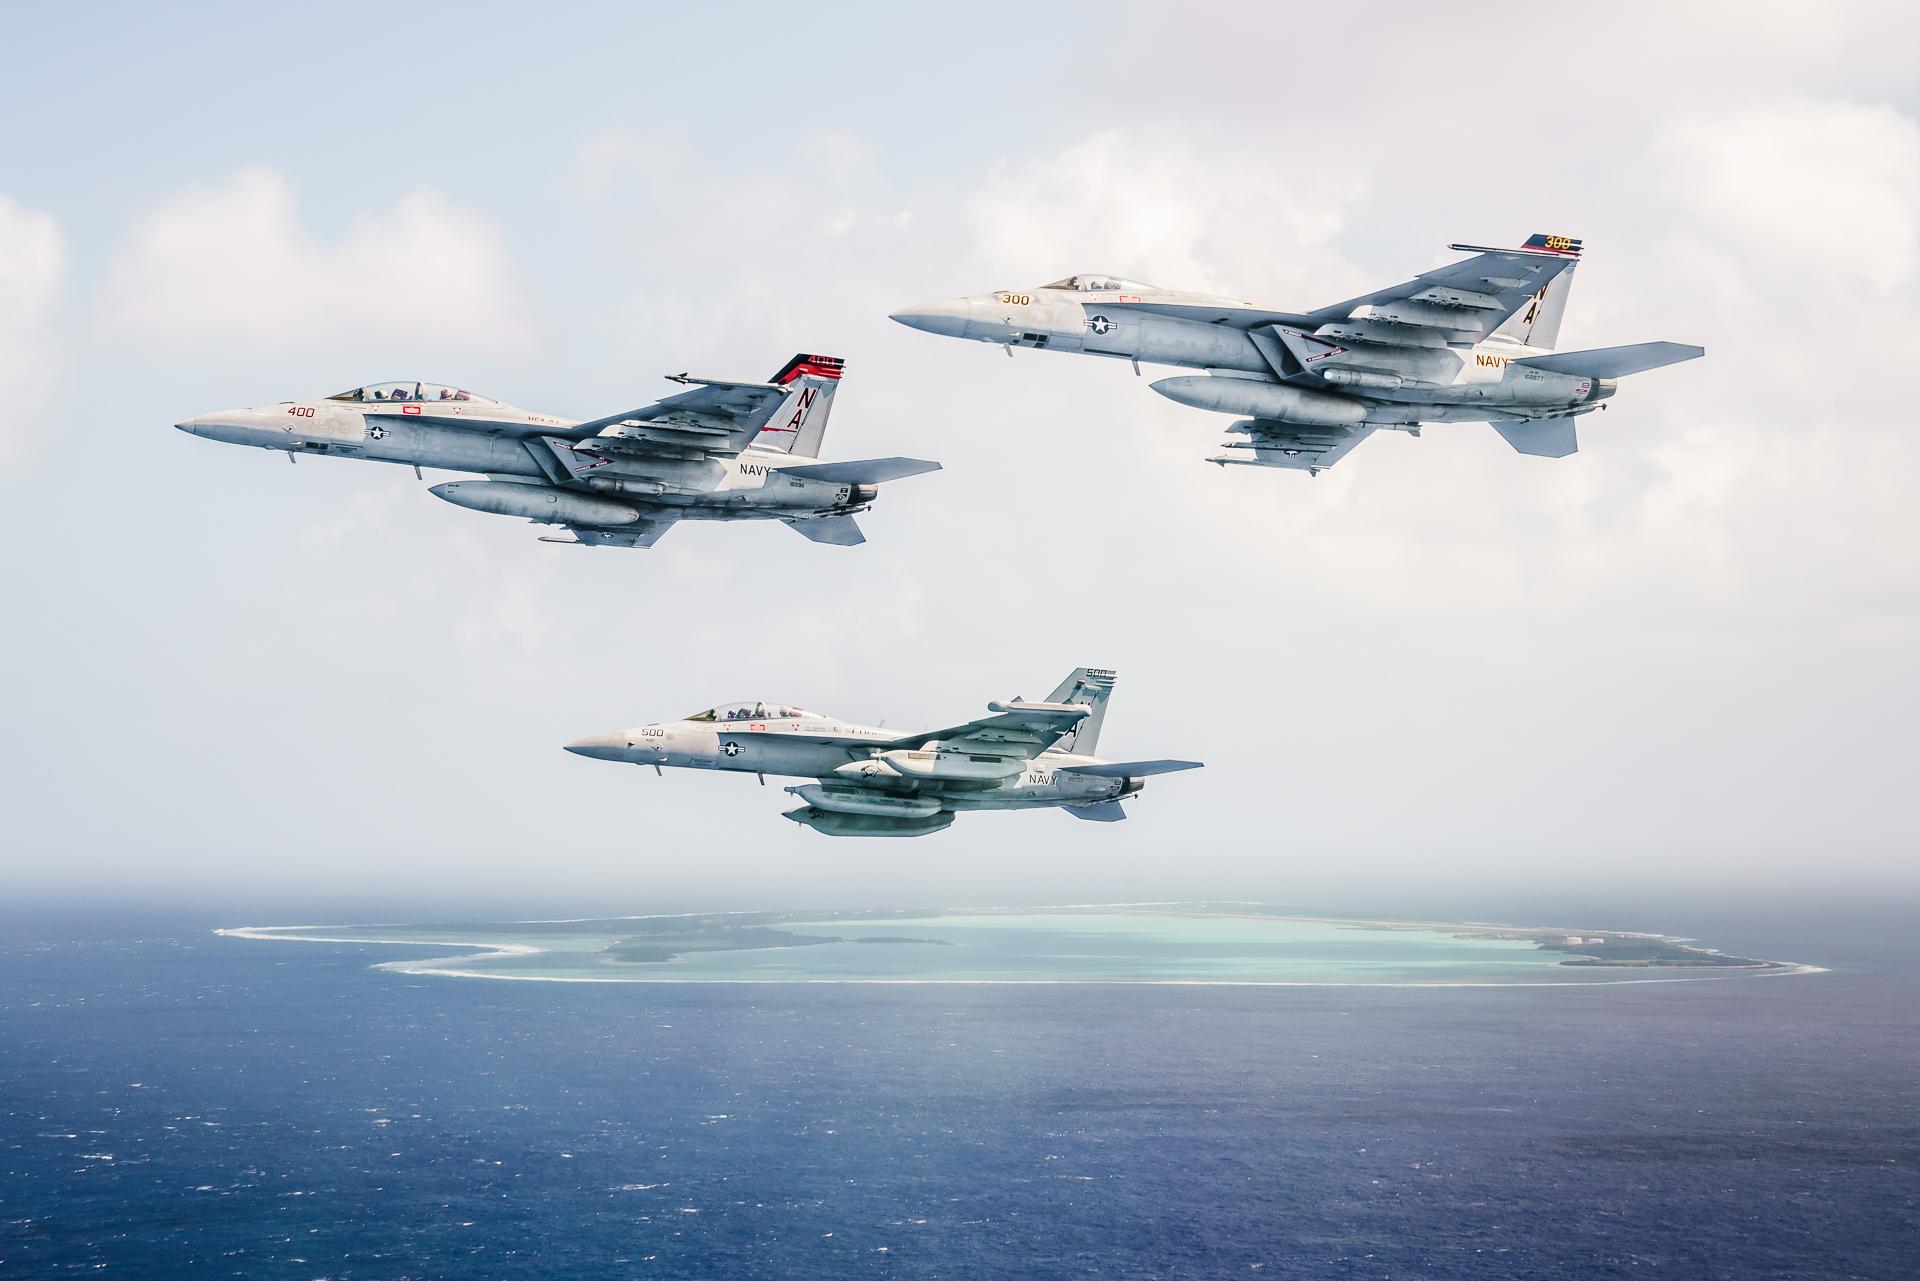 File:FA-18E of VFA-113, FA-18F of VFA-94 and EA-18G of VAQ-139 in